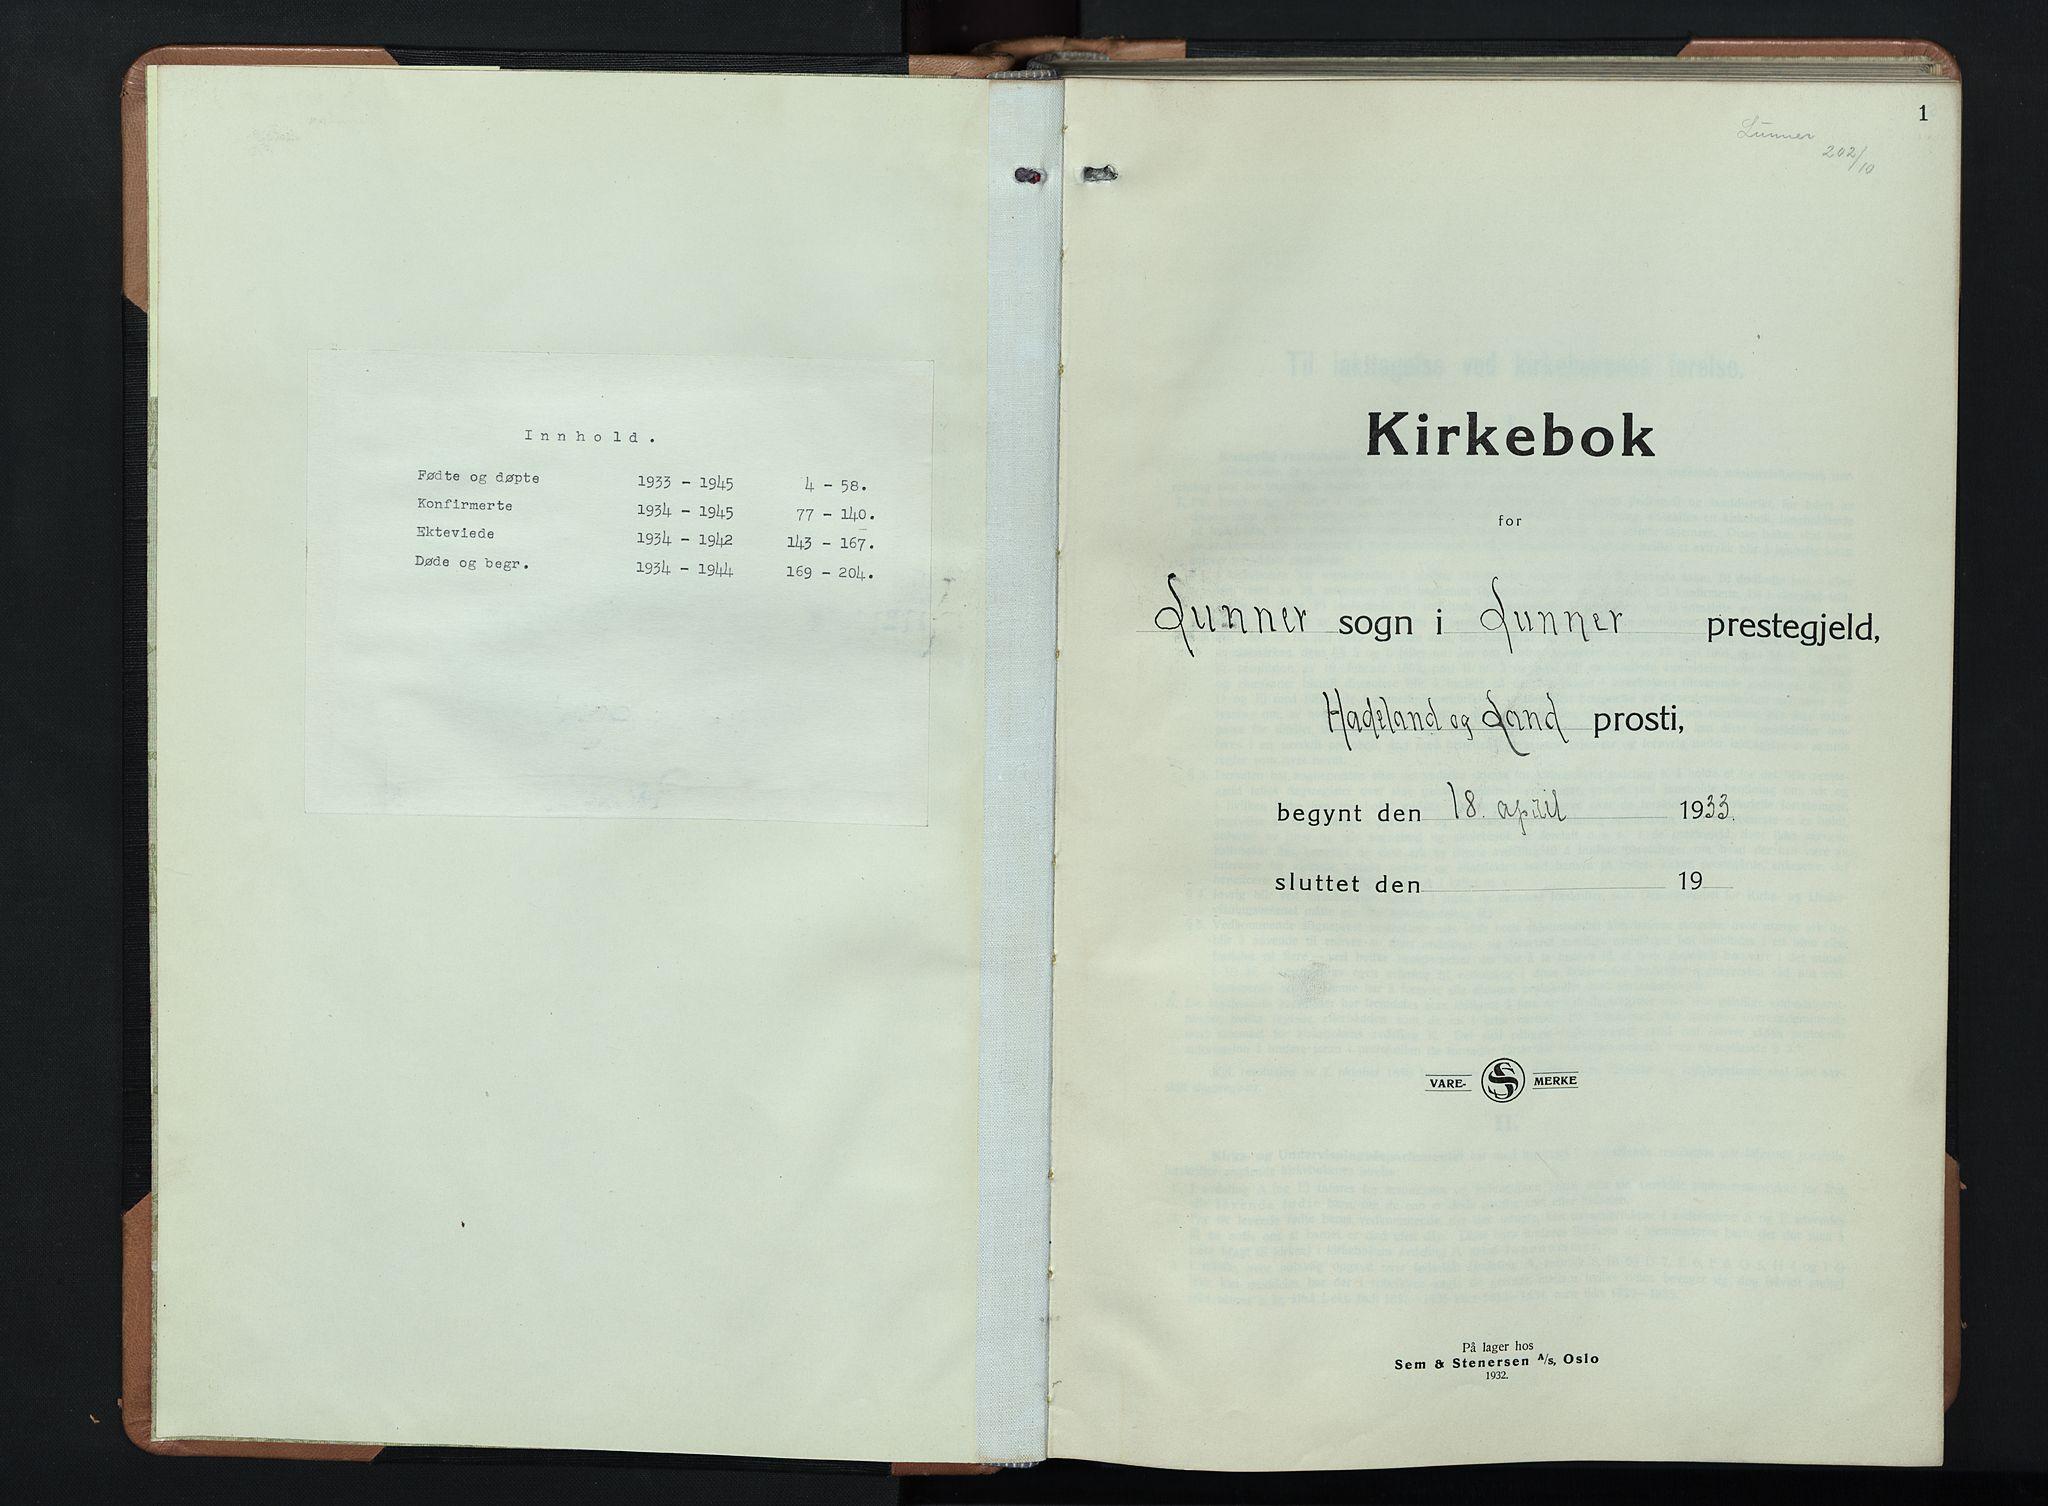 SAH, Lunner prestekontor, H/Ha/Hab/L0003: Klokkerbok nr. 3, 1933-1945, s. 1